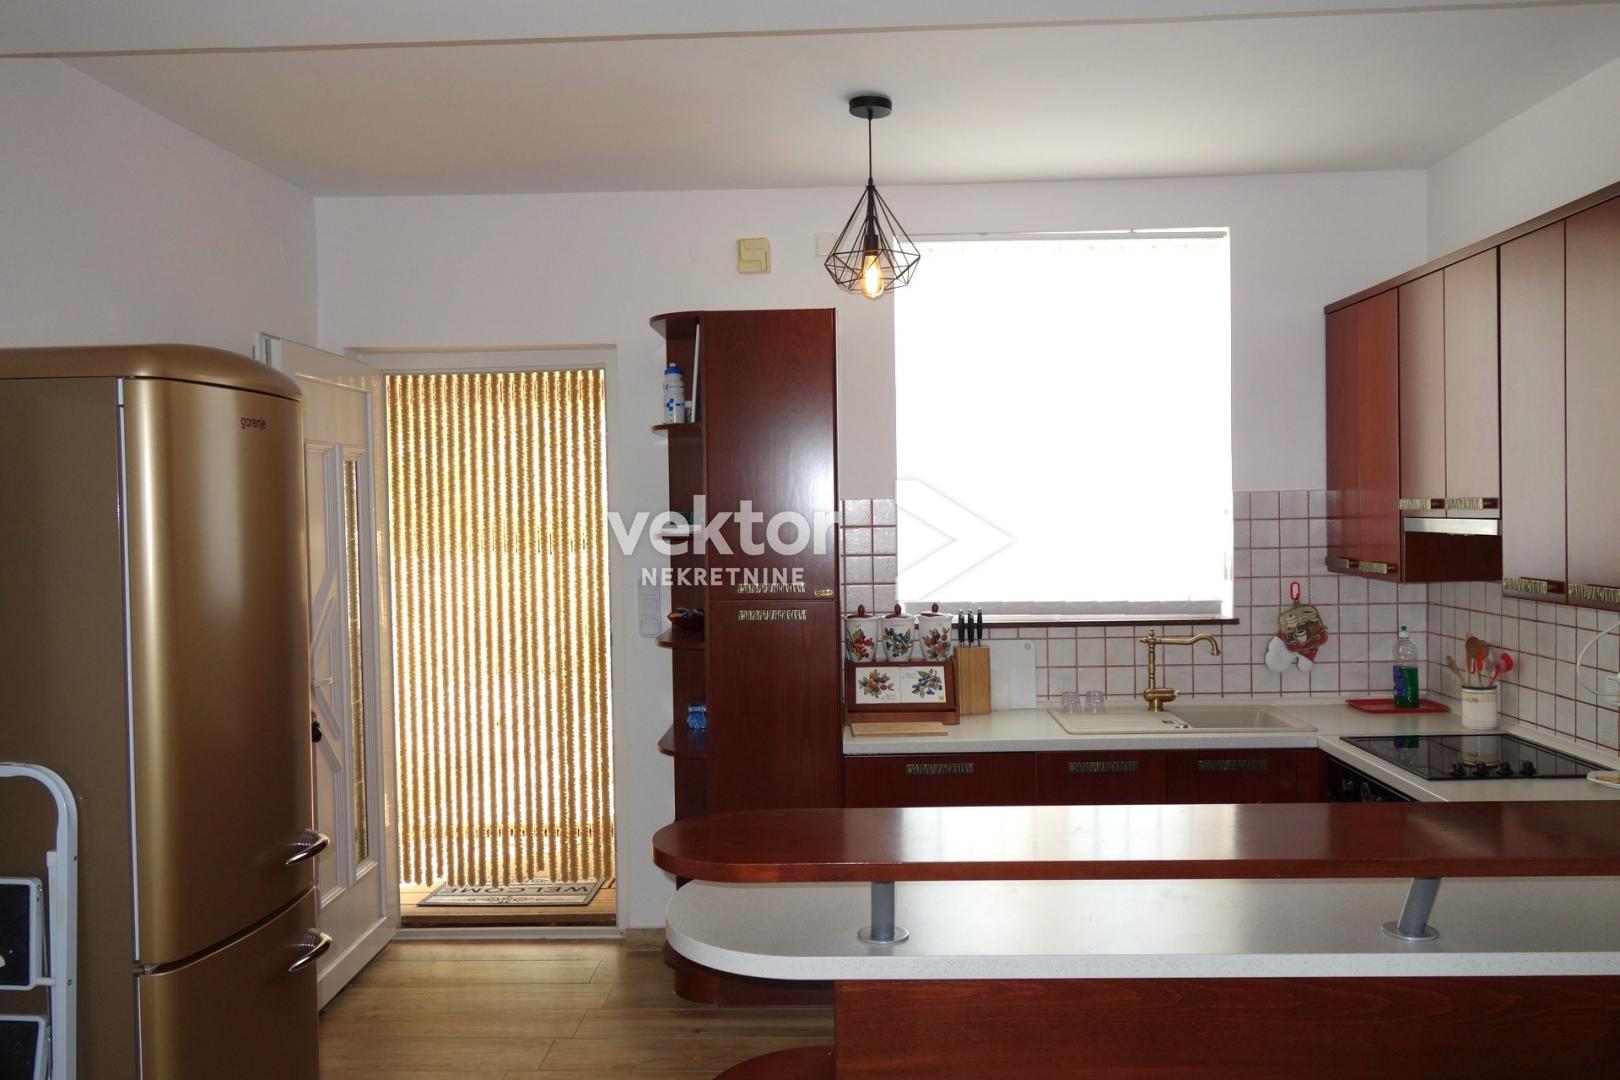 Apartman, otok Krk, Malinska, 70m2, 100m od mora